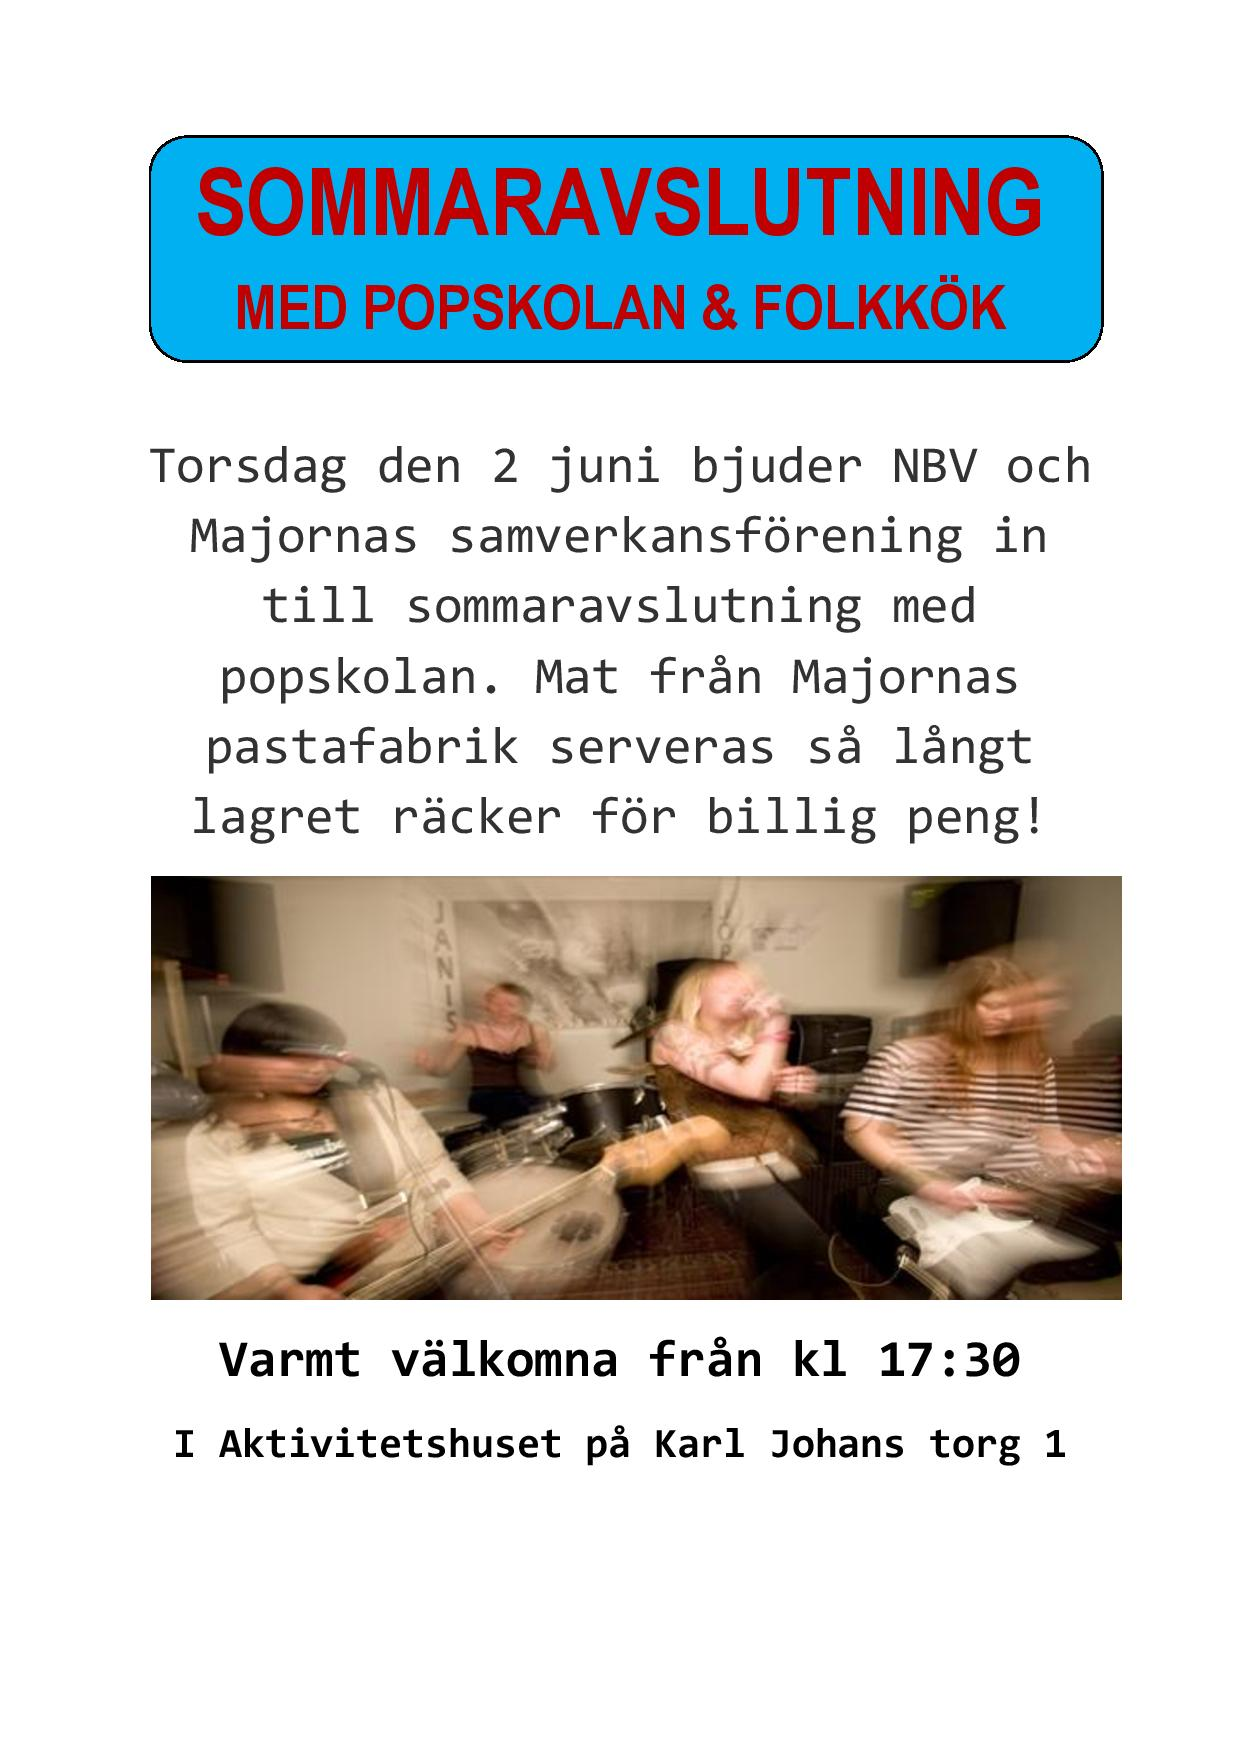 SOMMARAVSLUTNING-popskolan-page-001